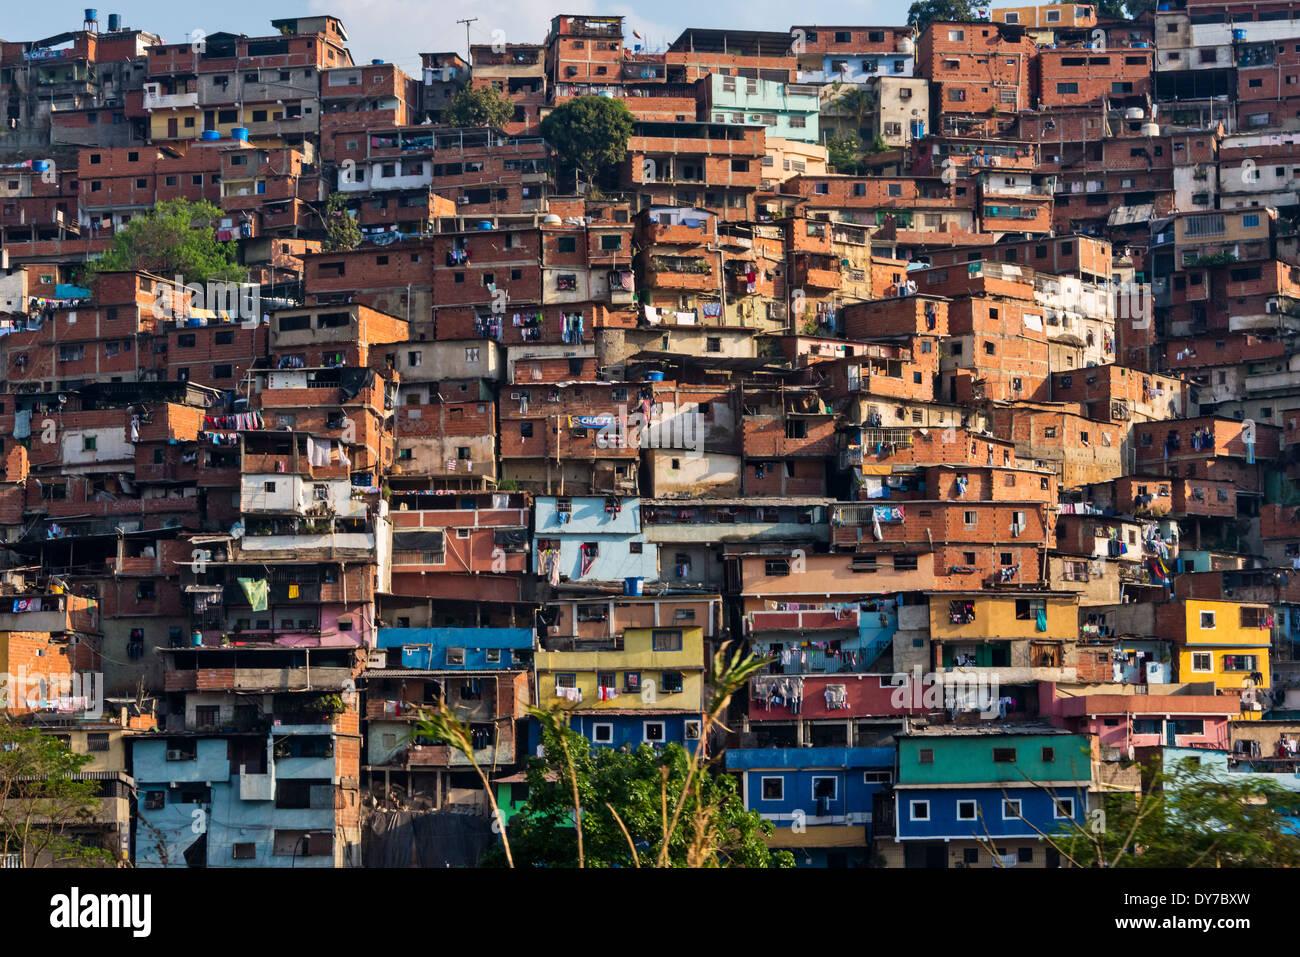 Image result for venezuela slums